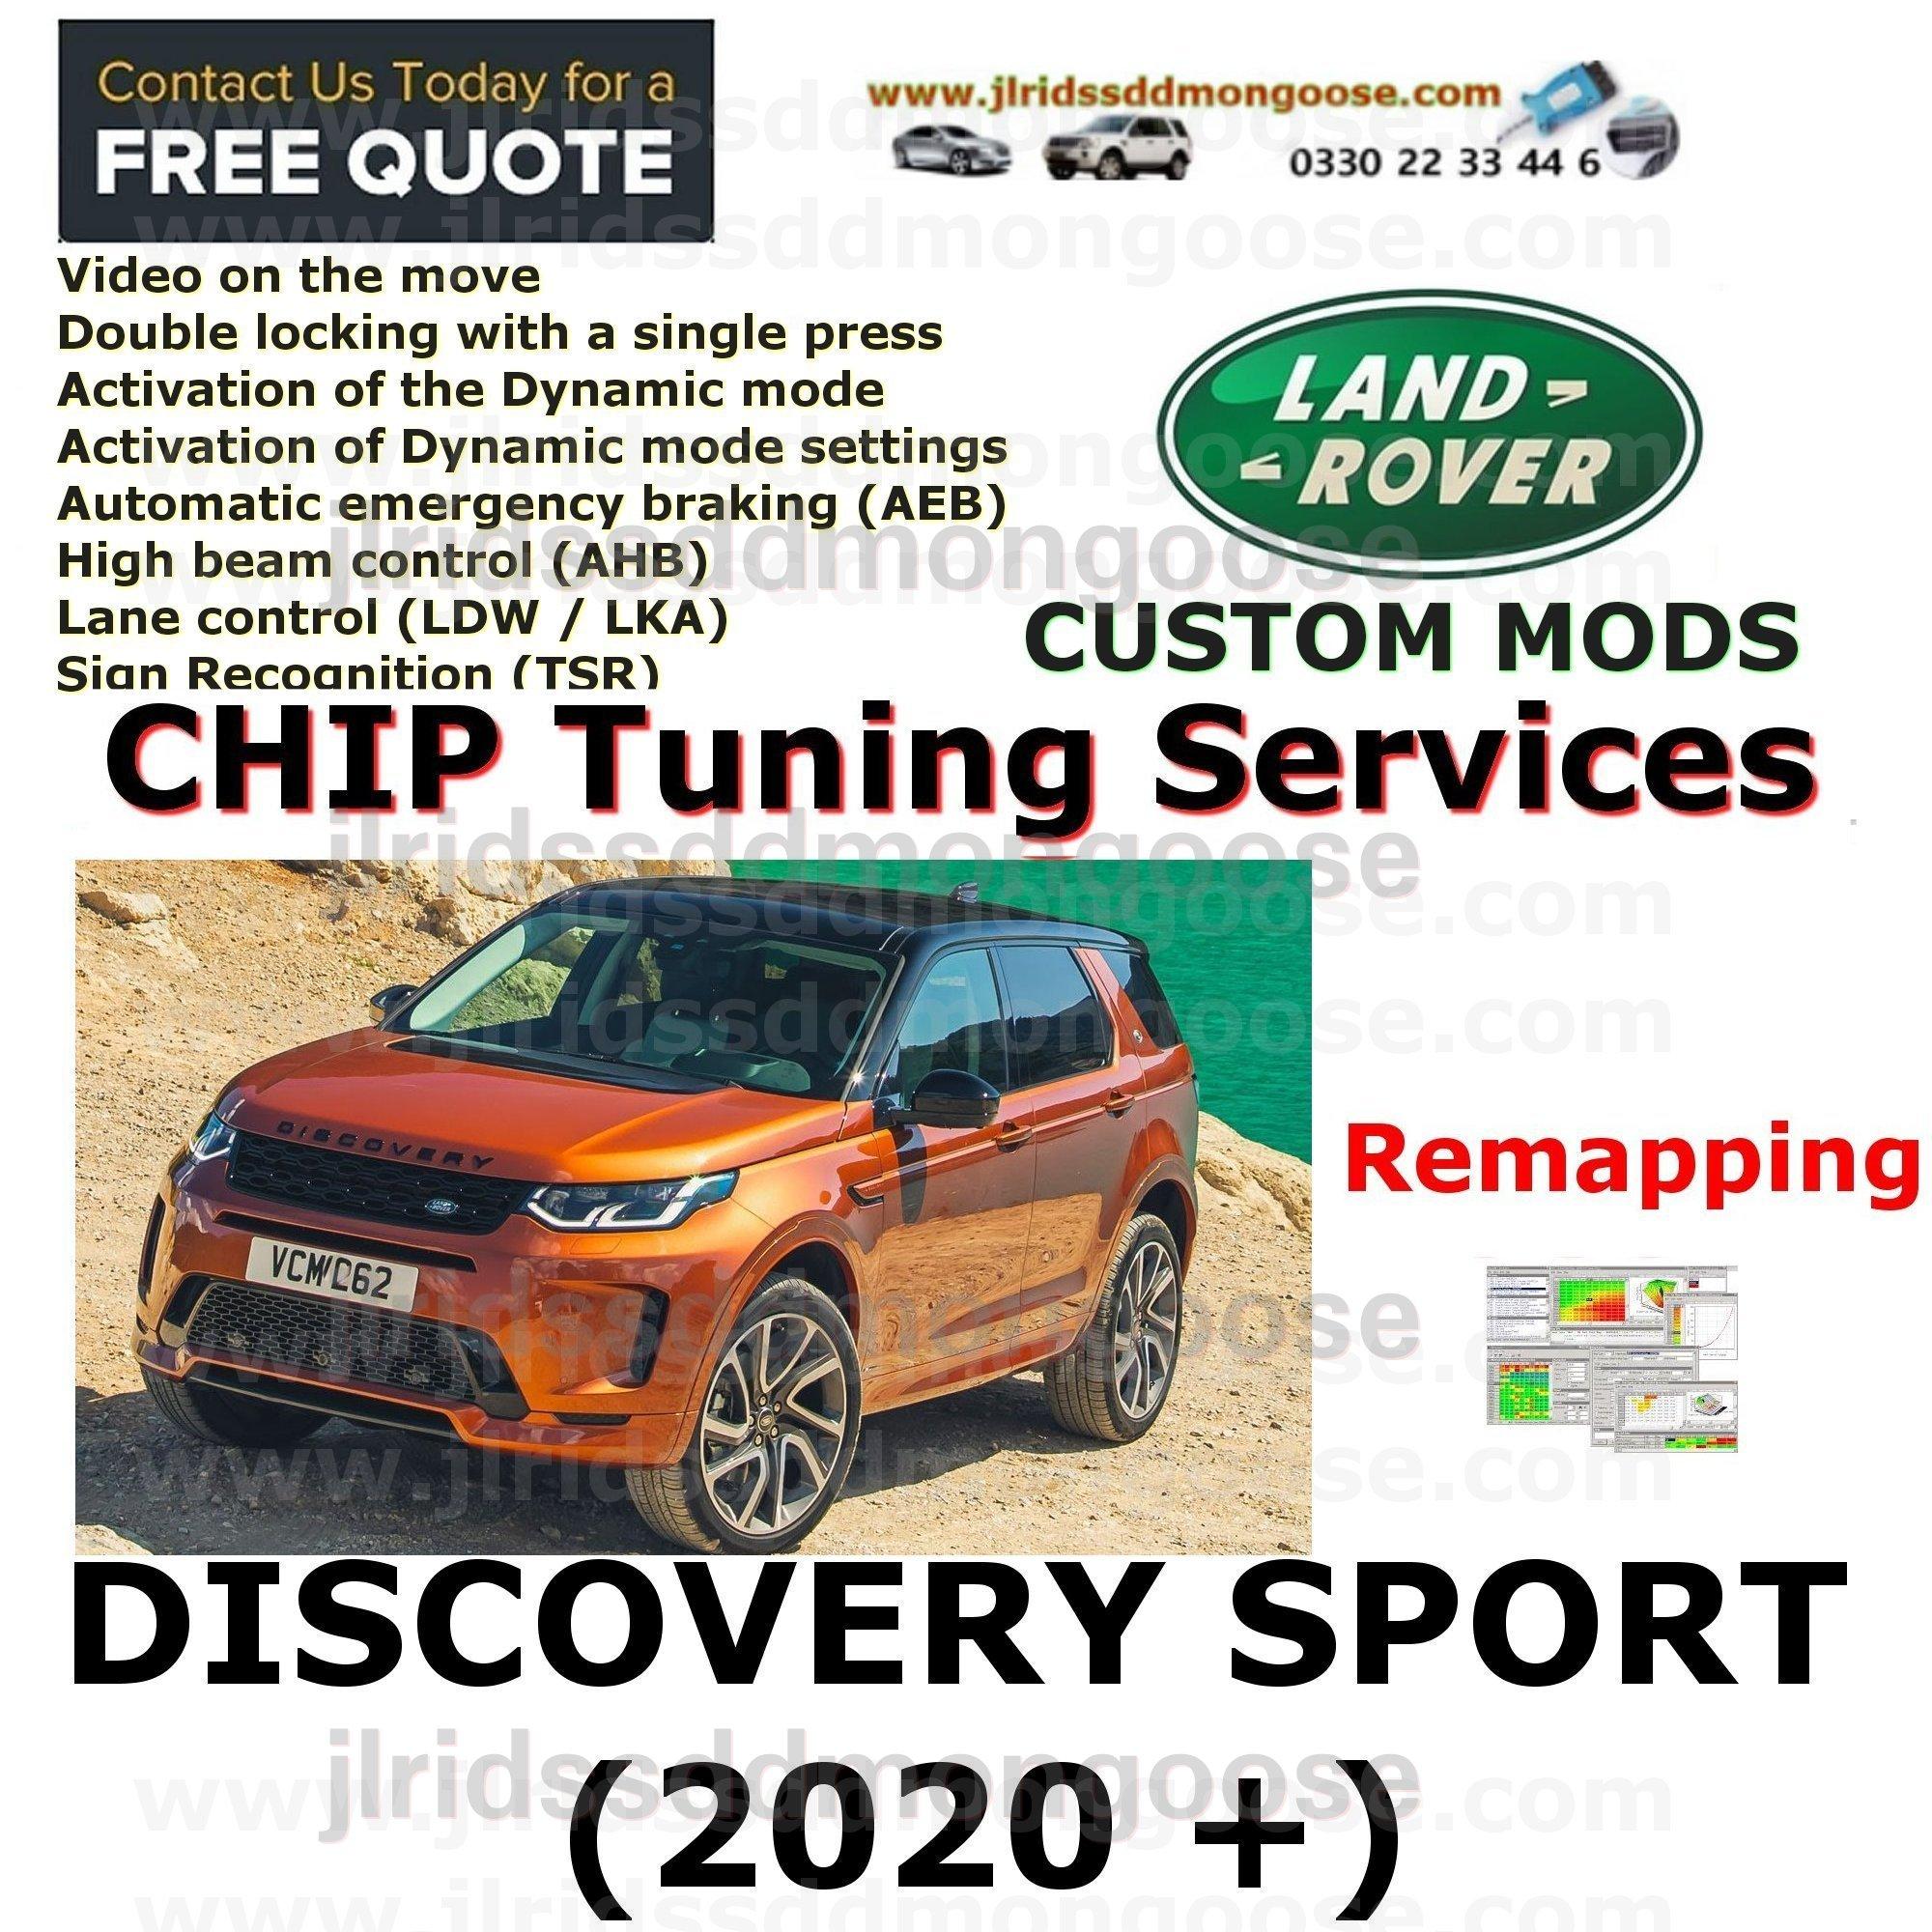 jlridssddmongoose.com/ccf-editing-coding/discovery-sport-2020-custom-coding-services/